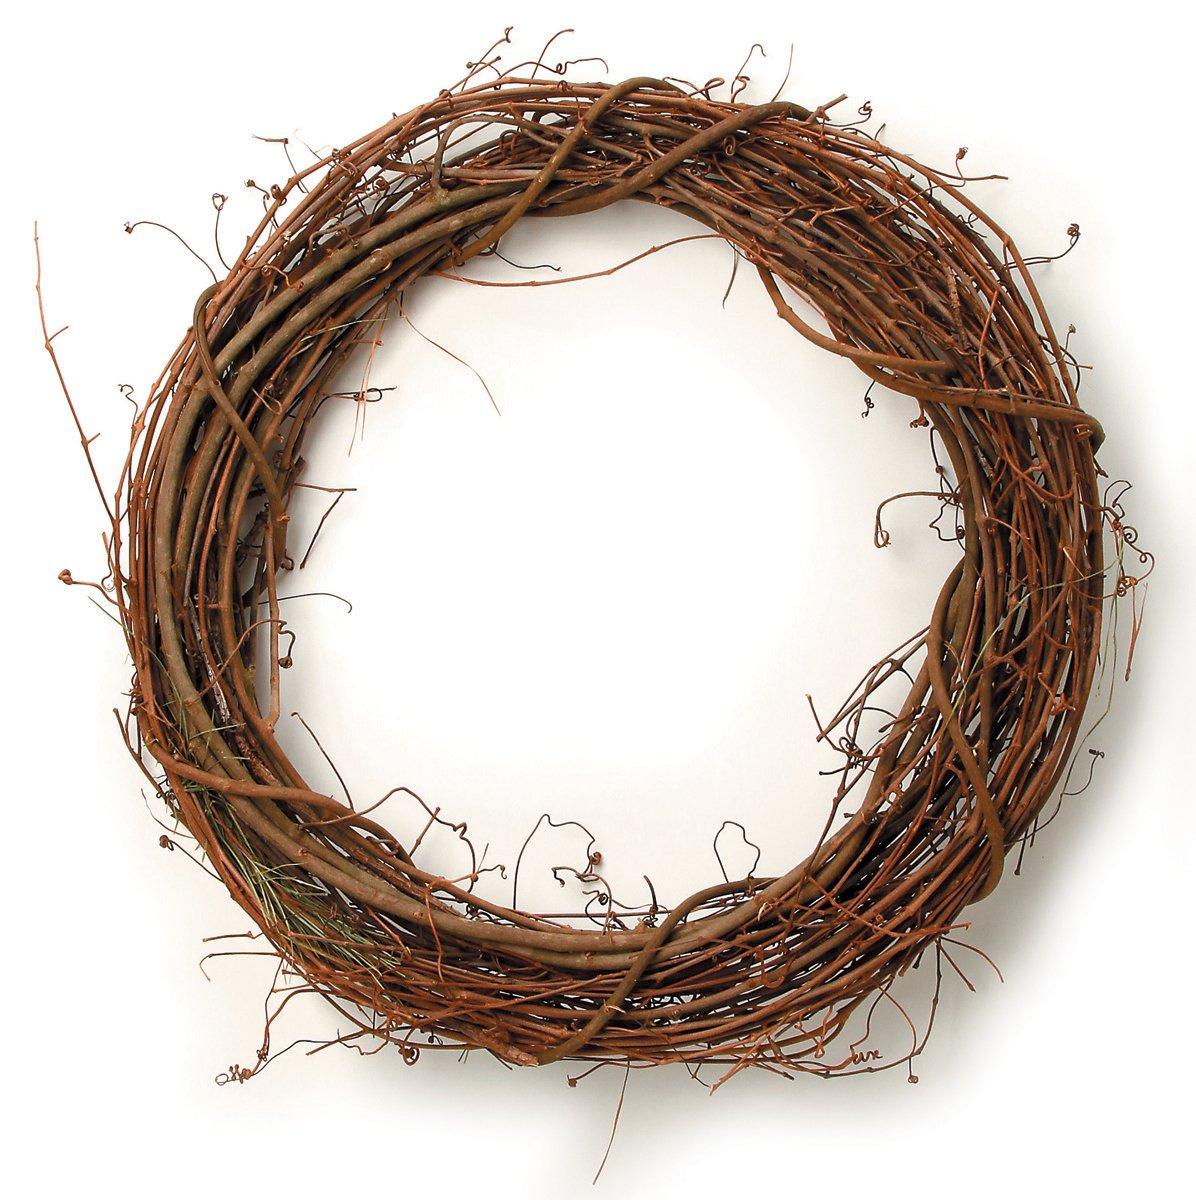 Darice-2803-50-Grapevine-Wreath-30